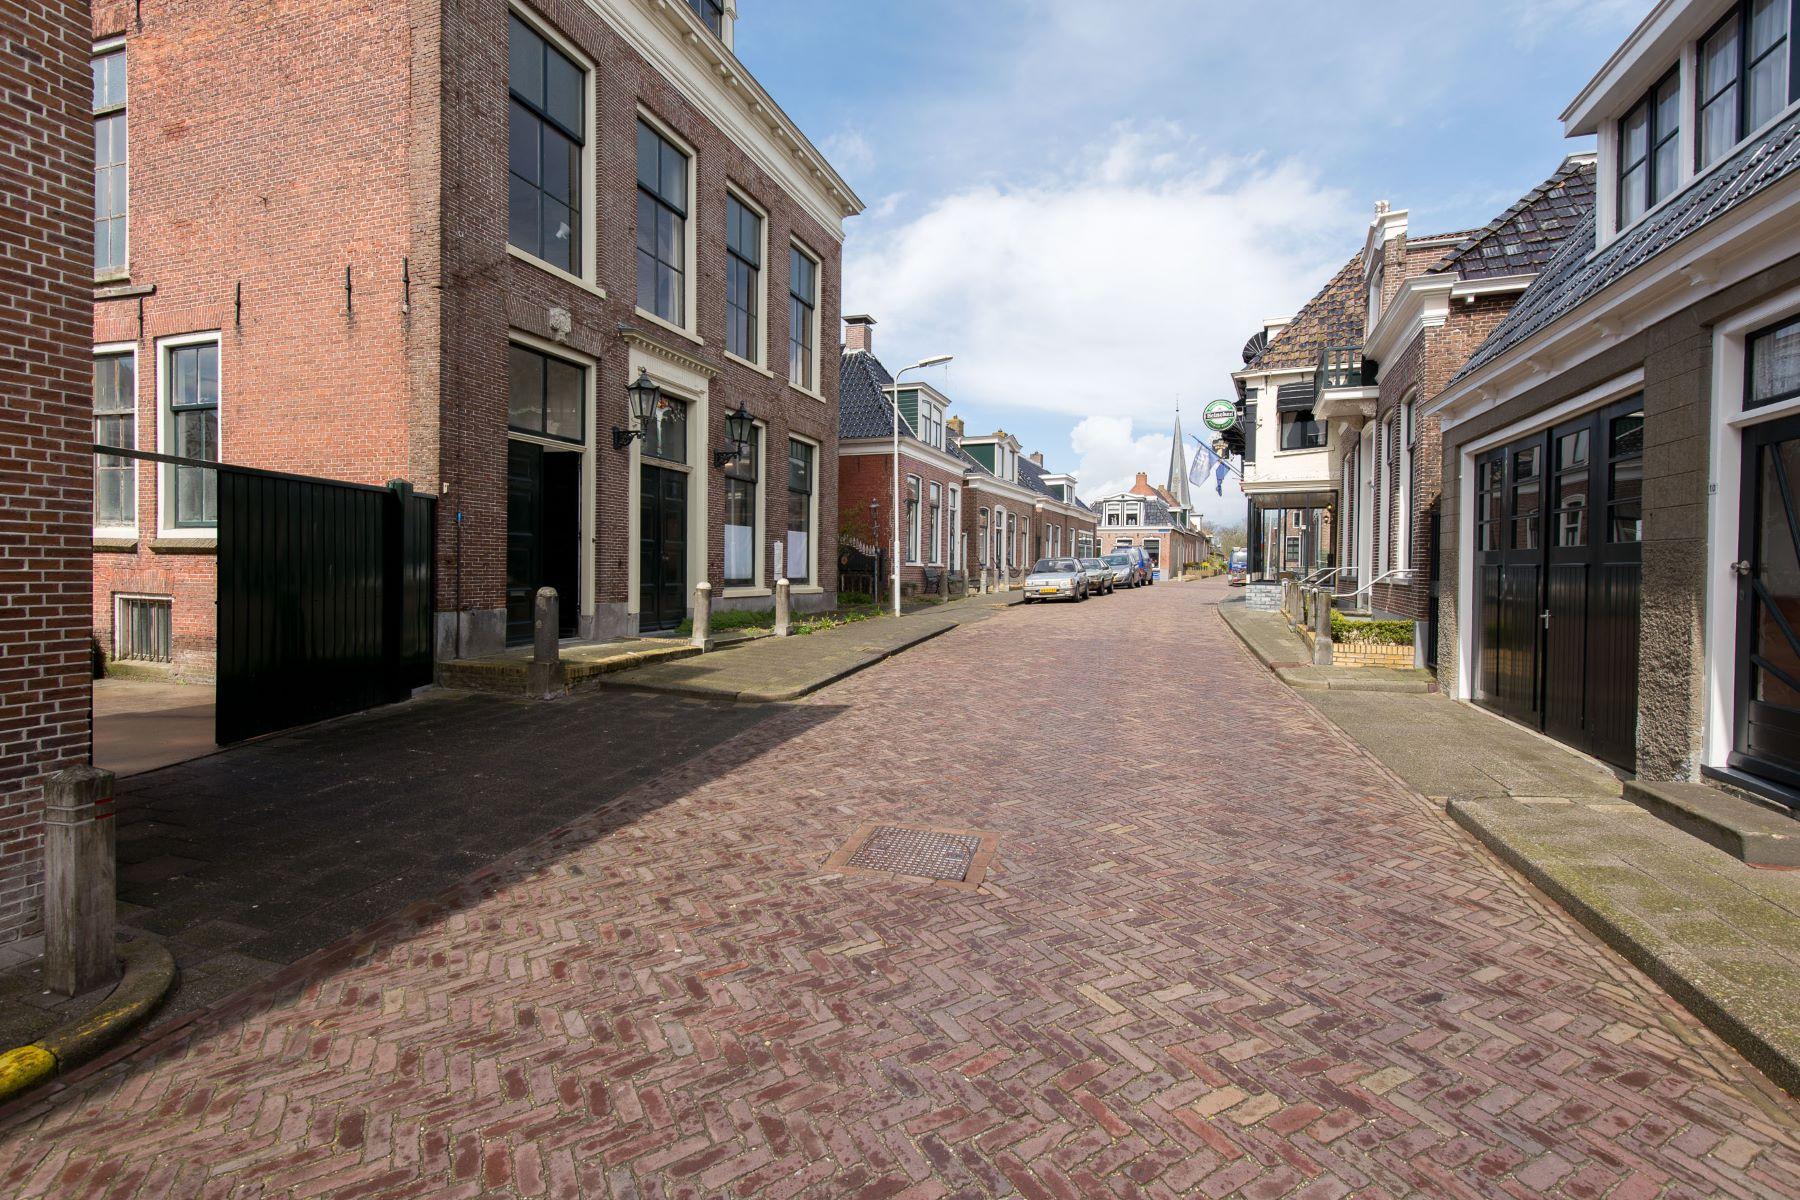 独户住宅 为 销售 在 Timeless and Monumental Townhouse Foarstrjitte 7 Holwerd, Friesland, 9151 HD 荷兰